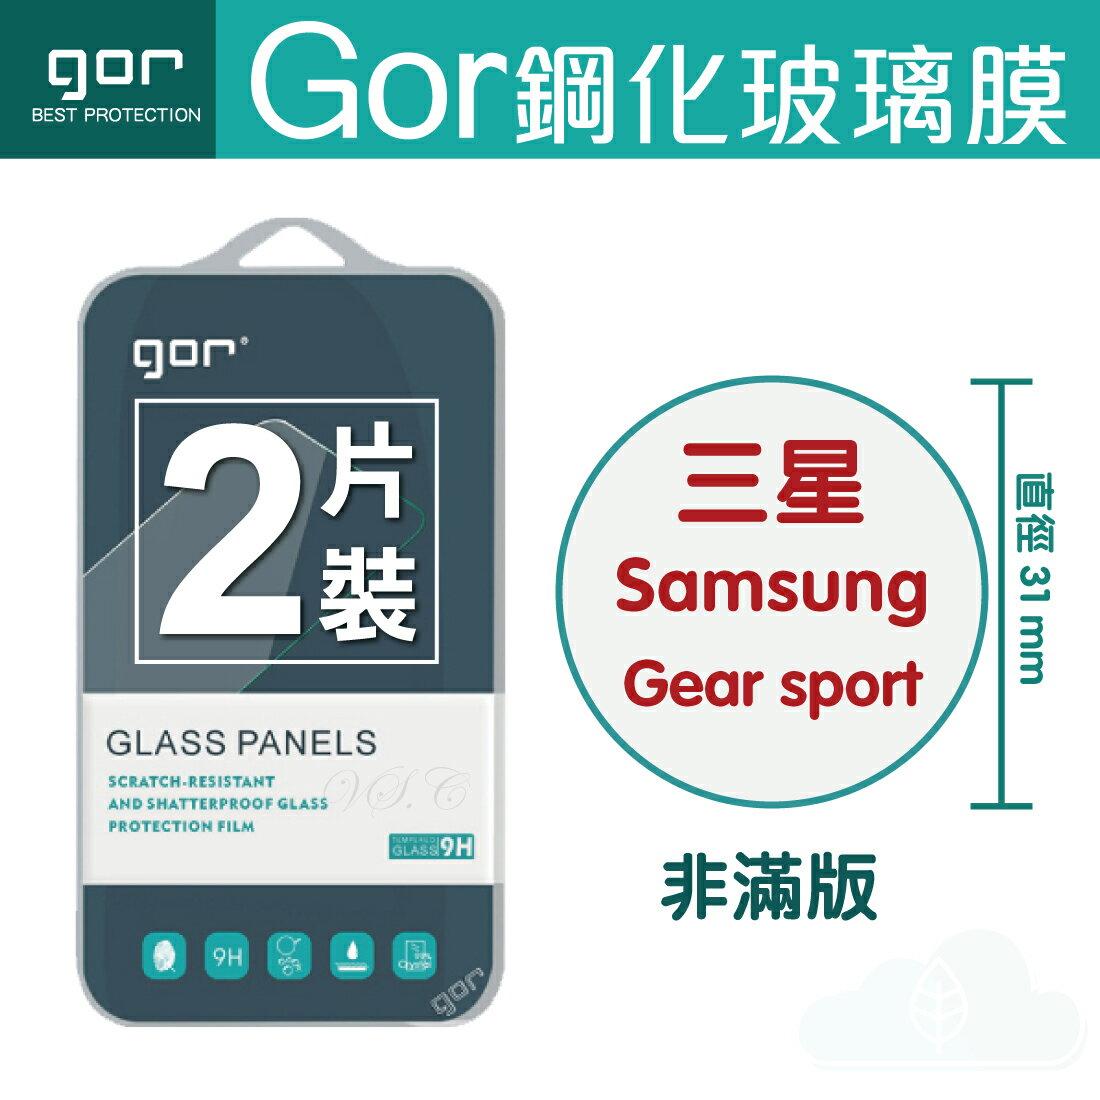 GOR 9H 三星 Samsung Gear Sport 手錶 鋼化 玻璃 保護貼 全透明非滿版 兩片裝【全館滿299免運費】